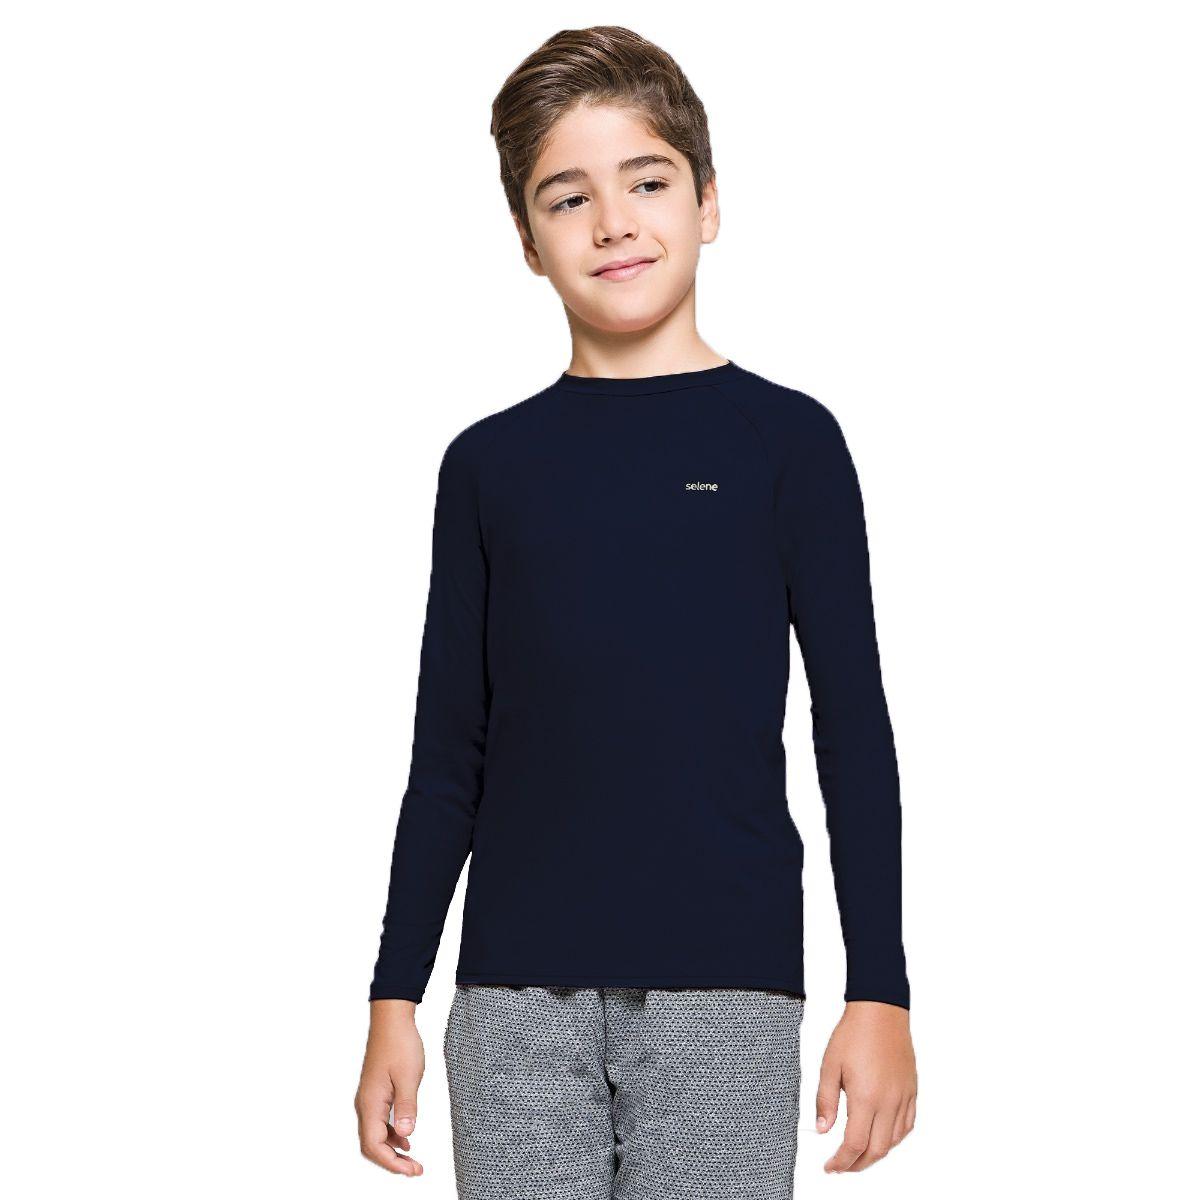 Camiseta juvenil manga longa com proteção UV Selene